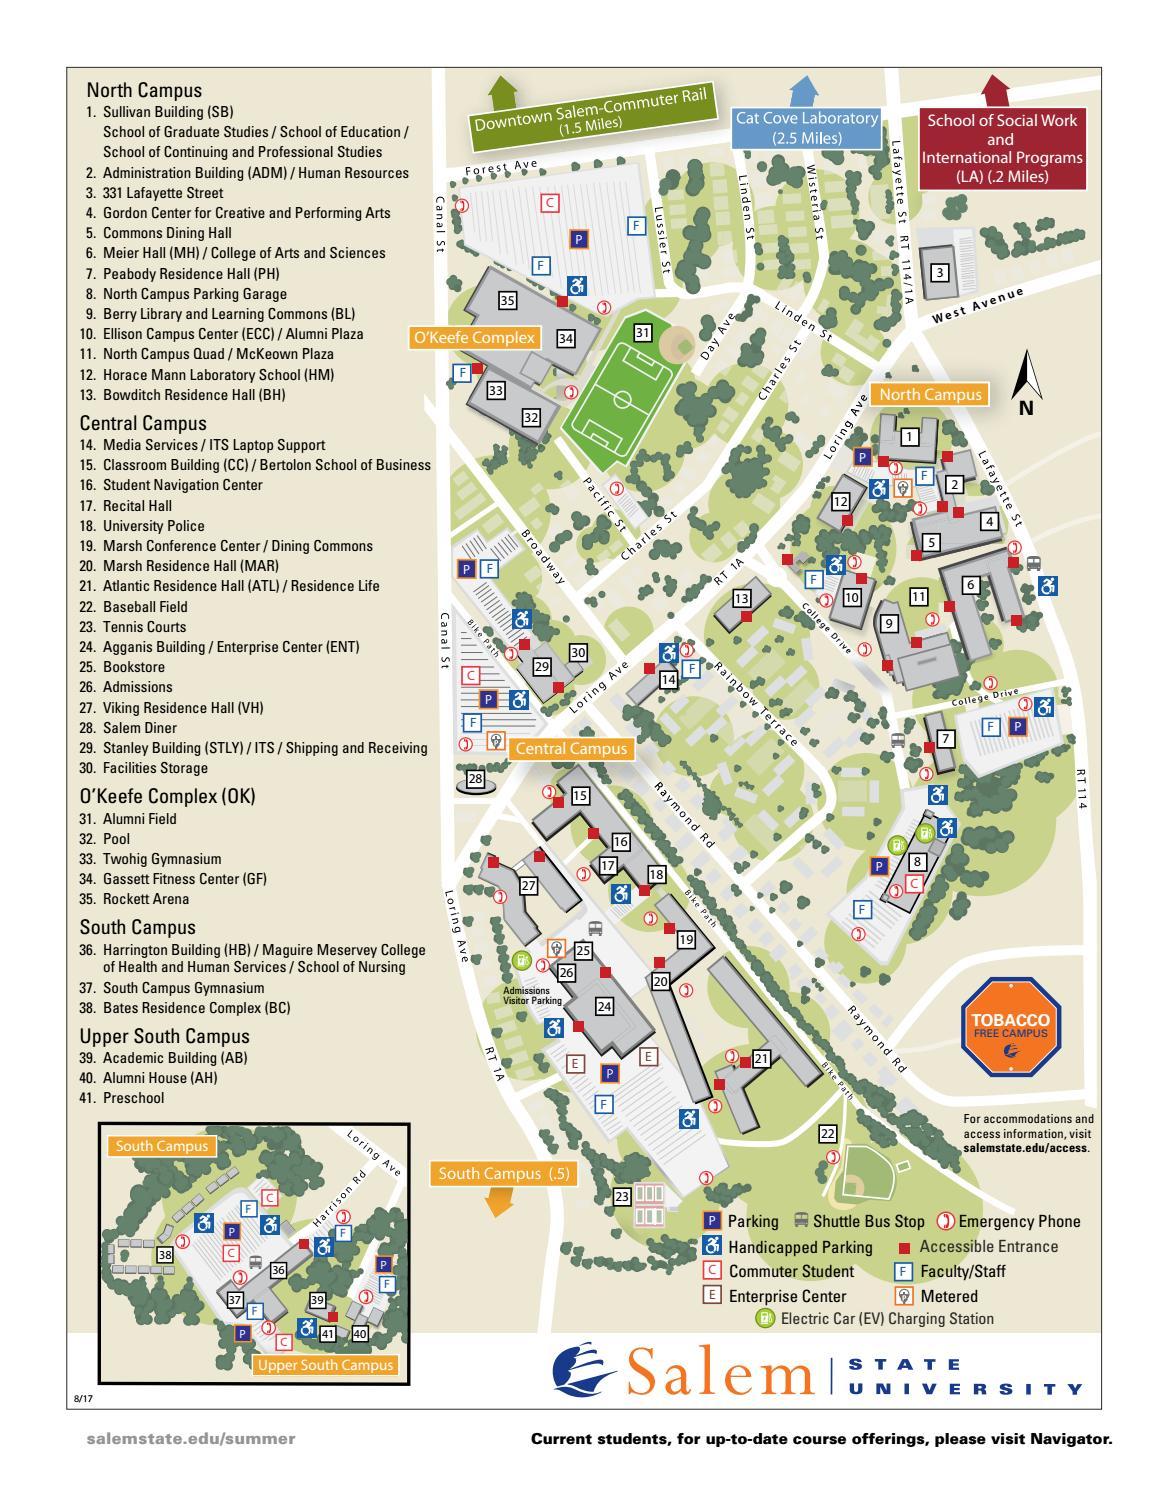 SSU Summer 2018 Undergraduate and Graduate Courses and Institutes by ...